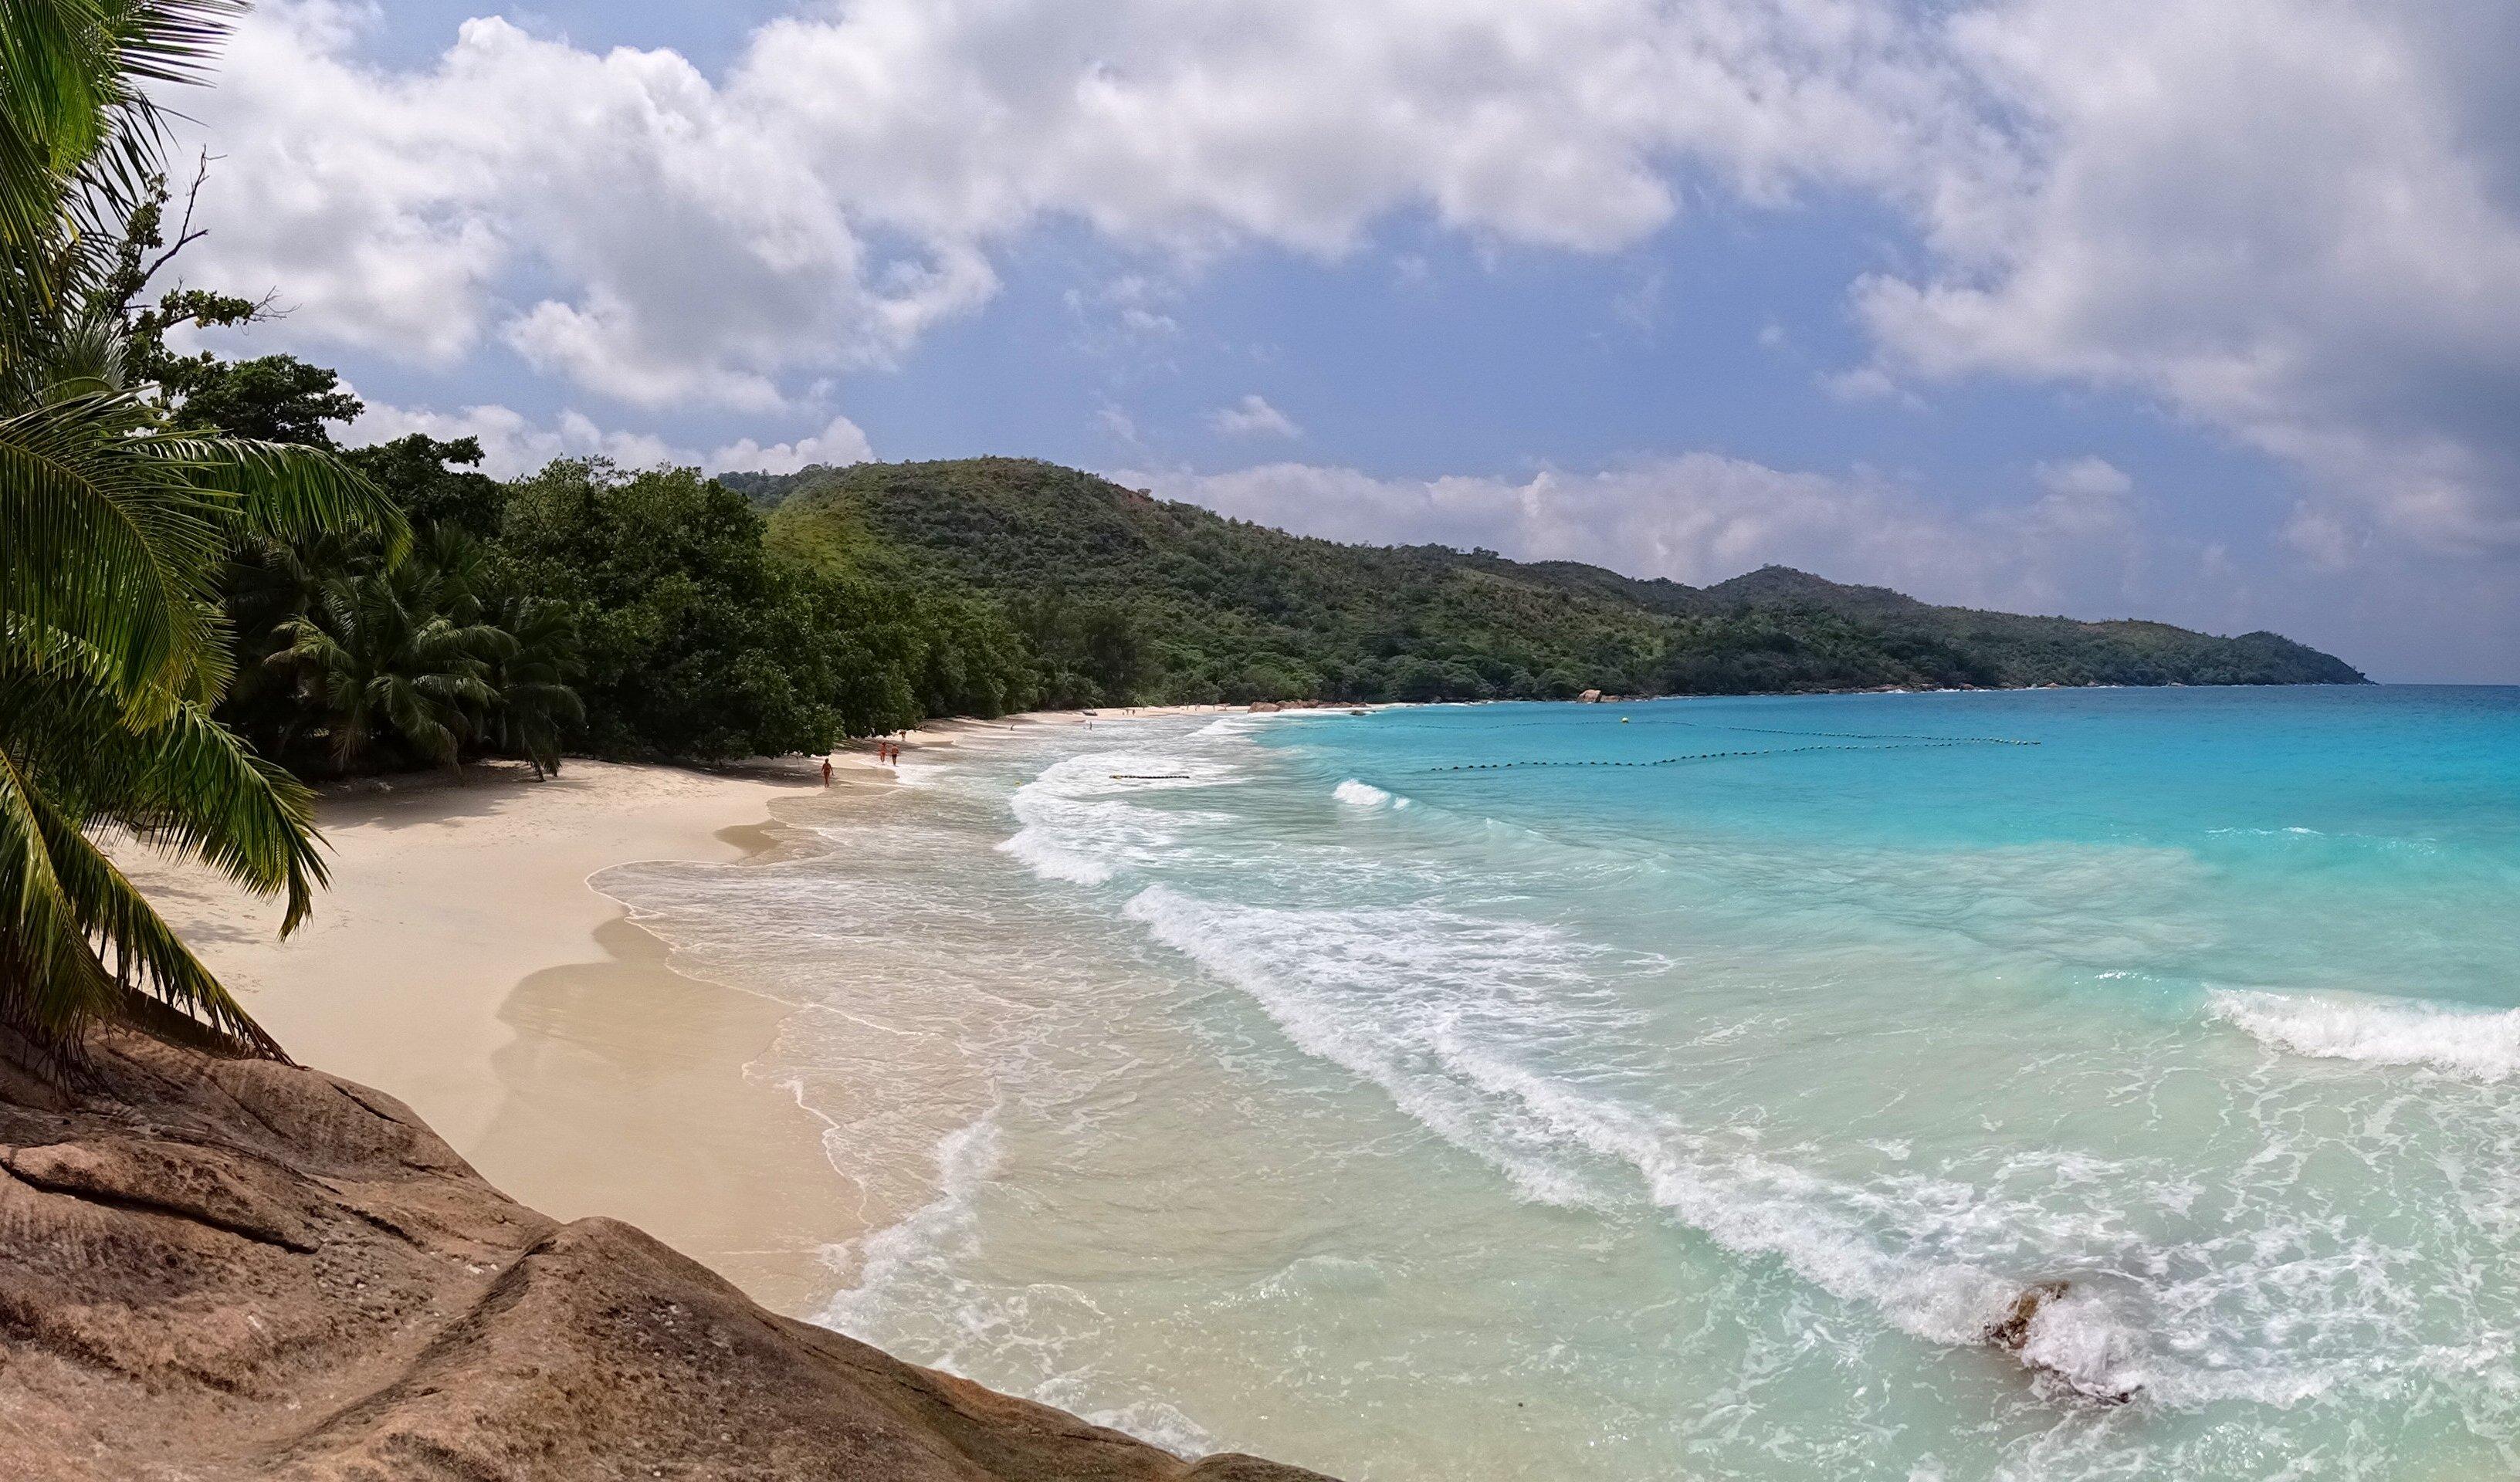 Anse Lazio Seychelles Most Stunning Beach Gets Ready